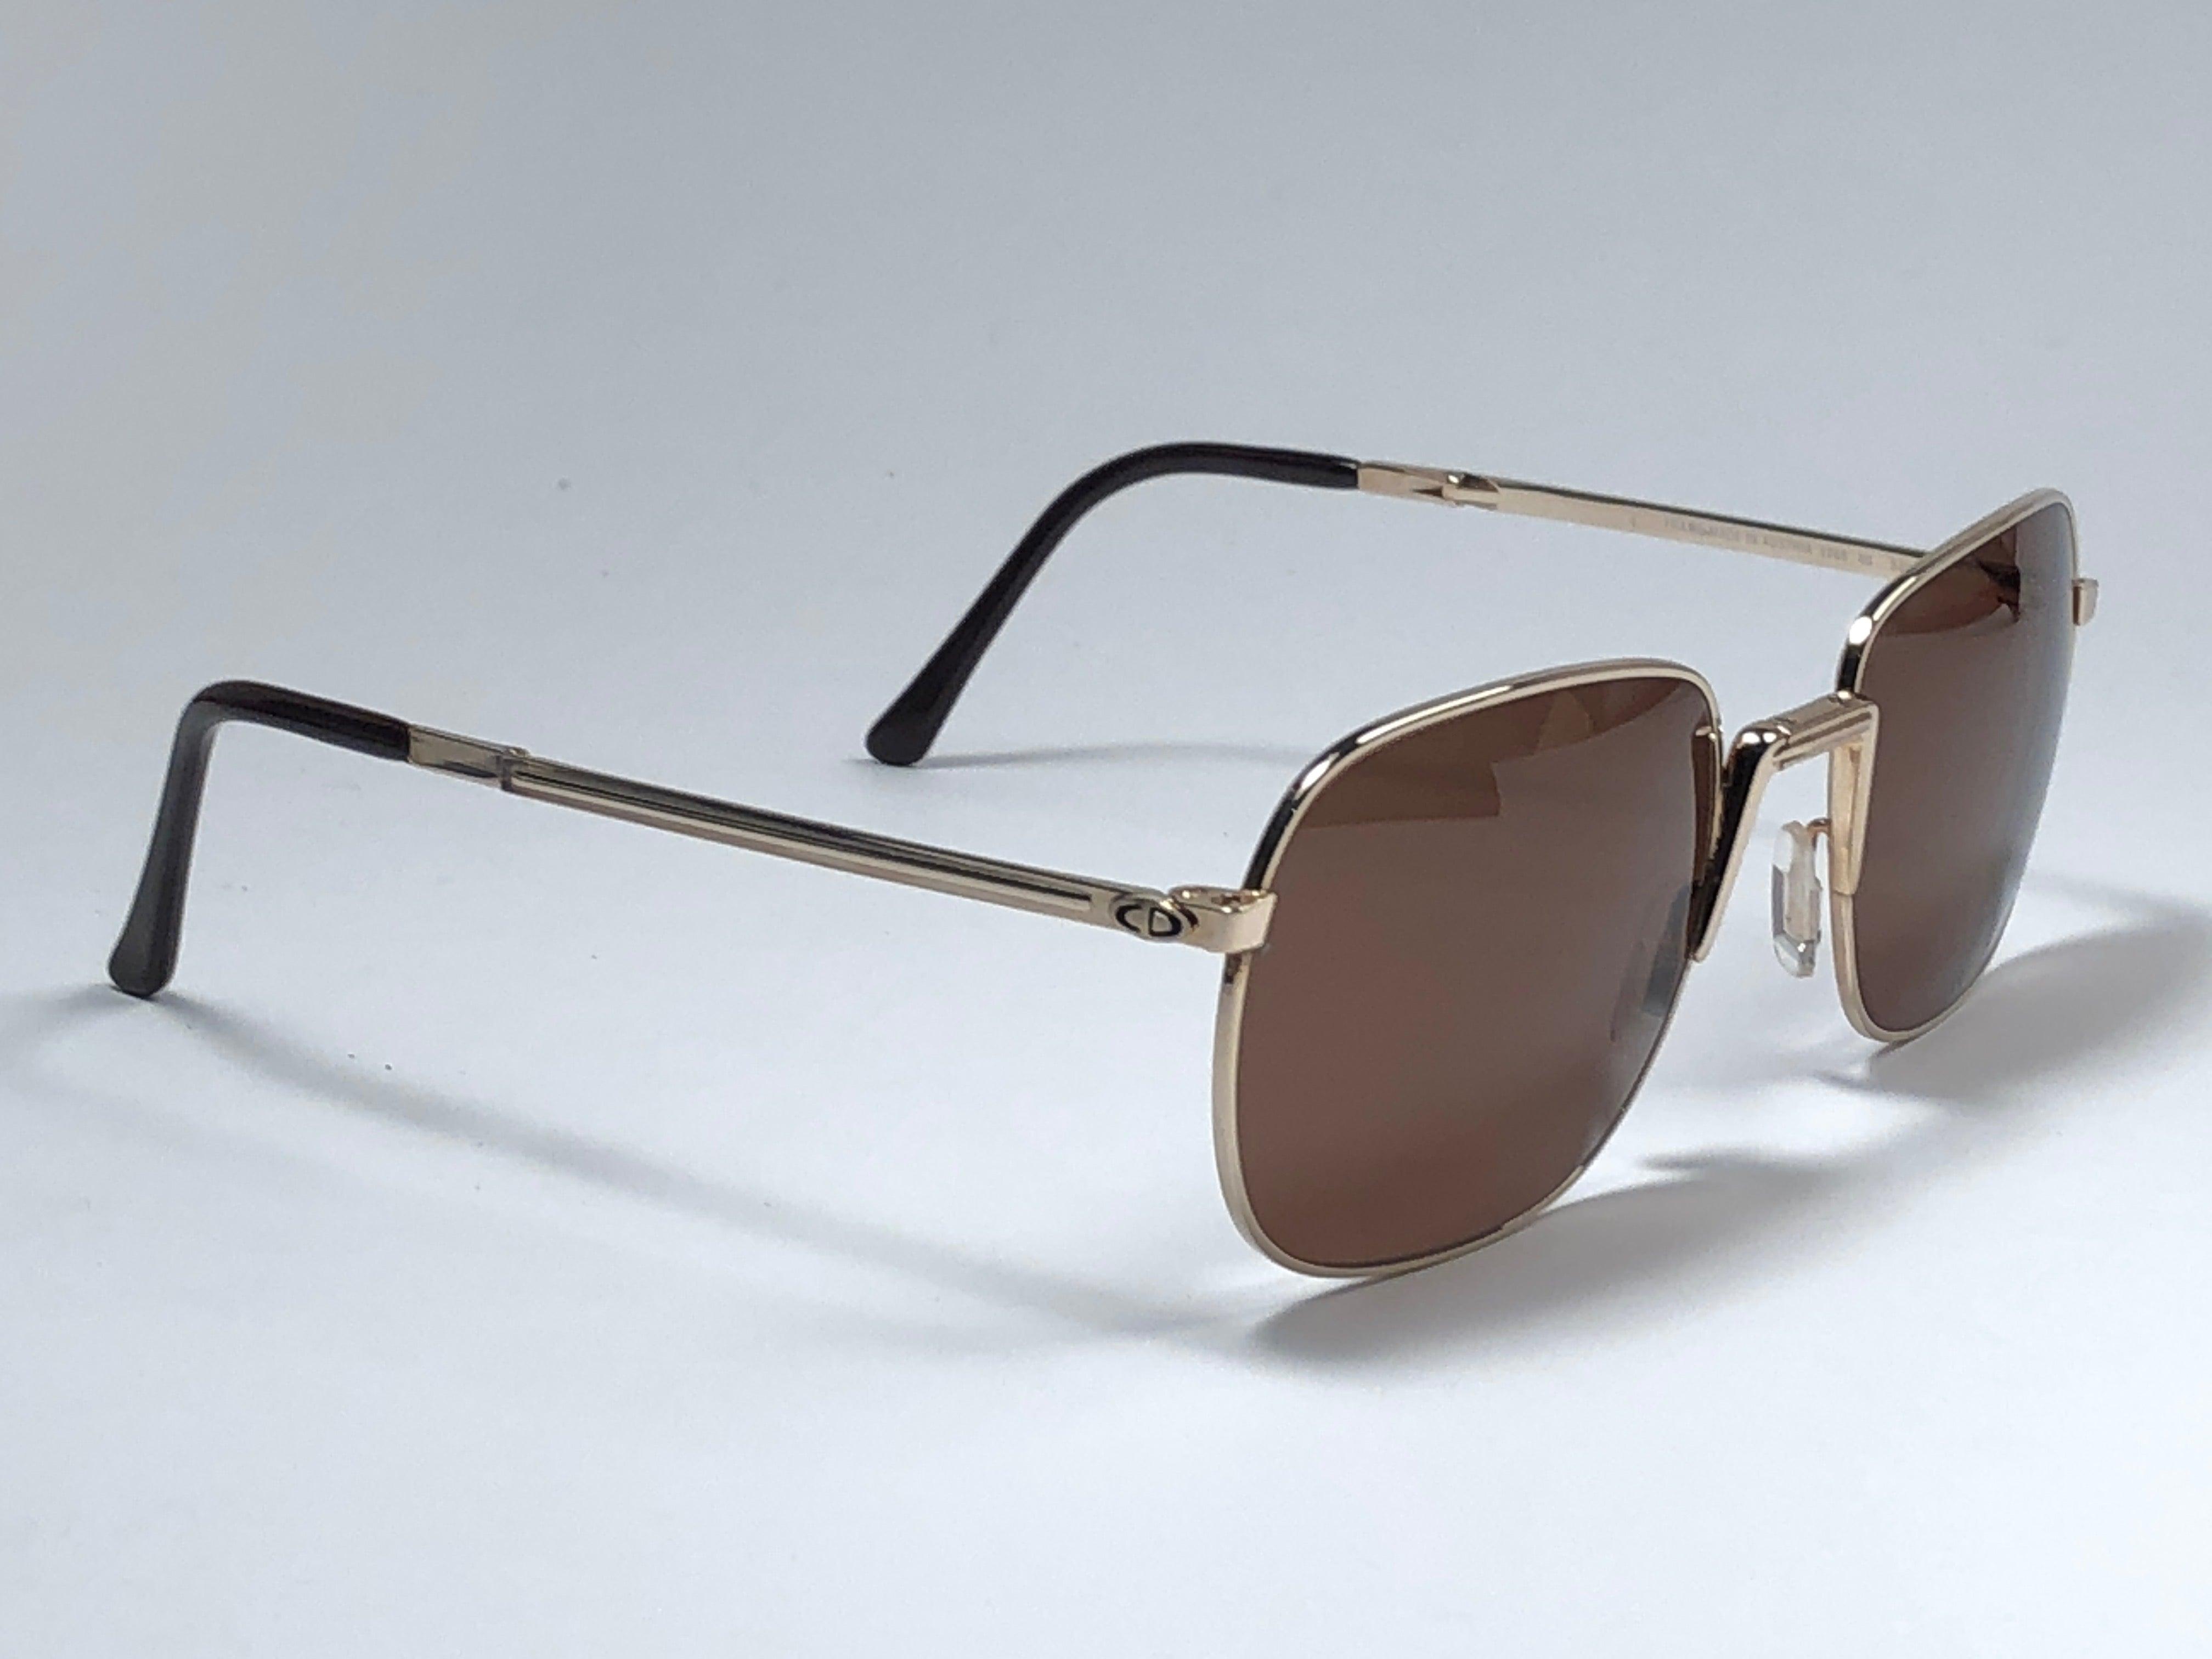 0ccab315abe New Vintage Christian Dior Monsieur 2288 Folding Brown Sunglasses 1970 s  Austria at 1stdibs